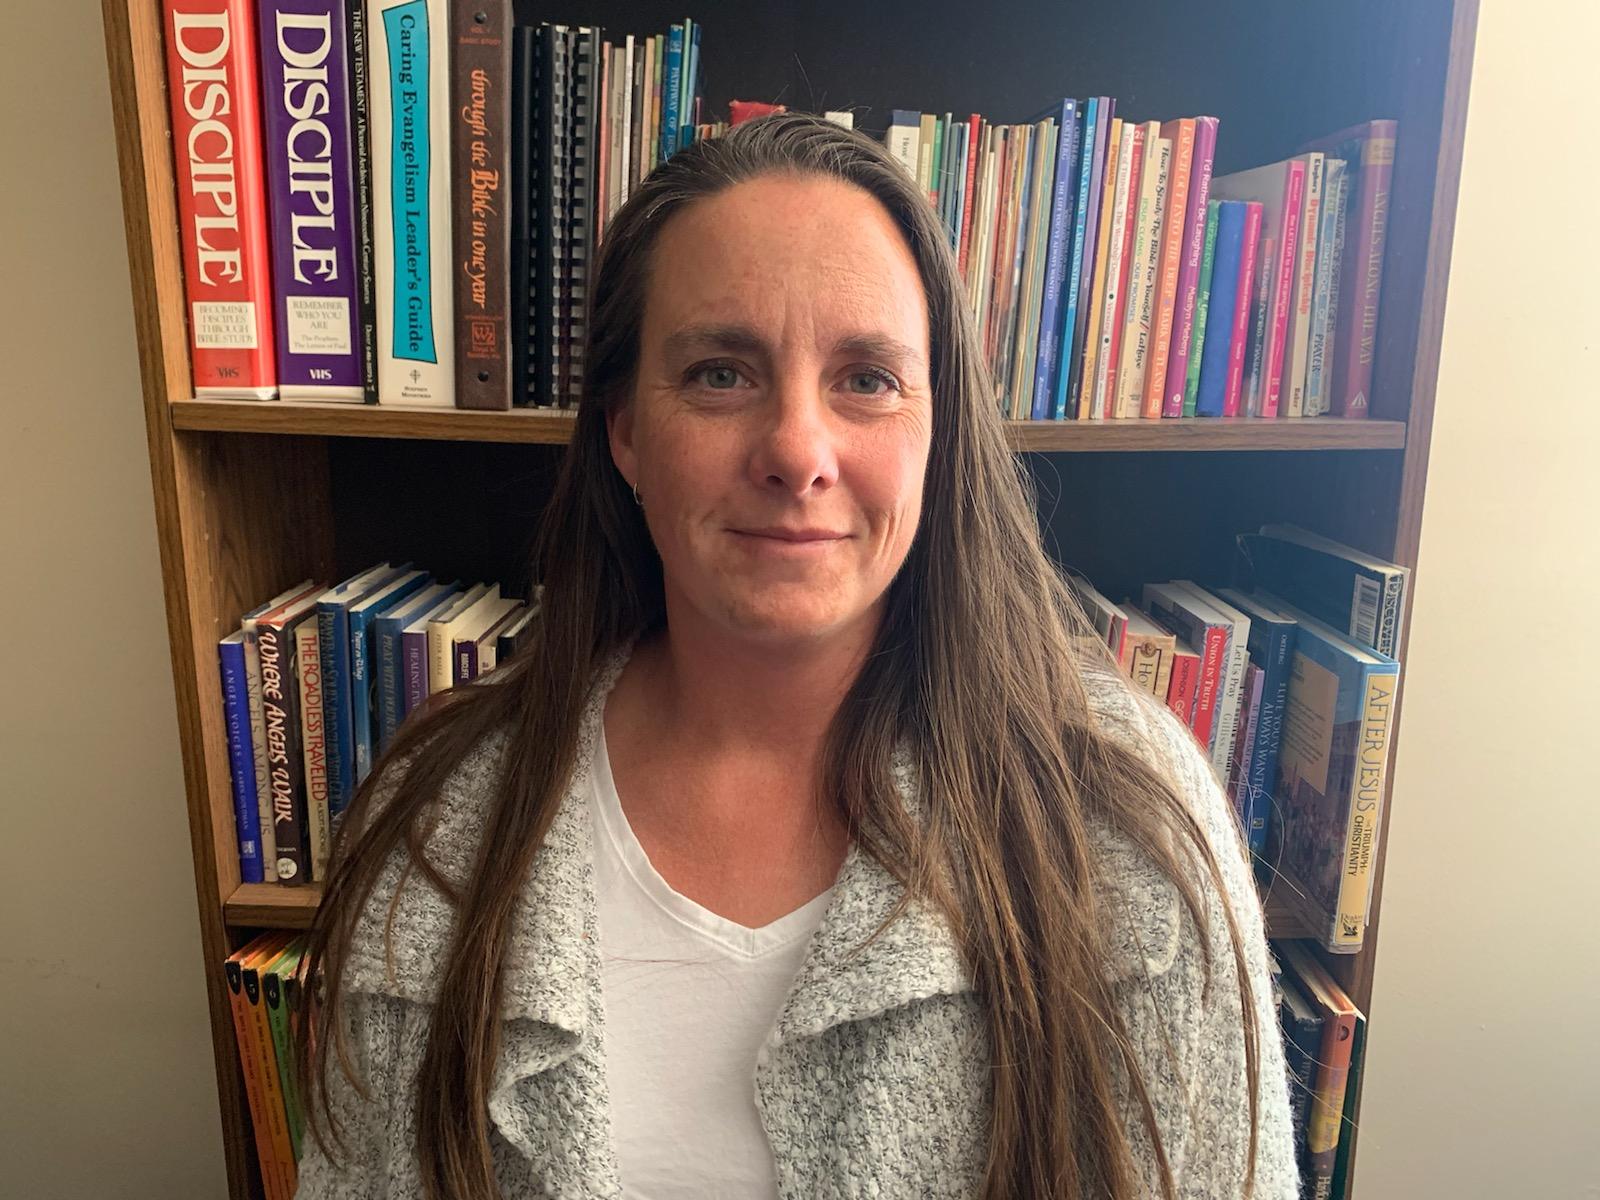 Shannon Konrad